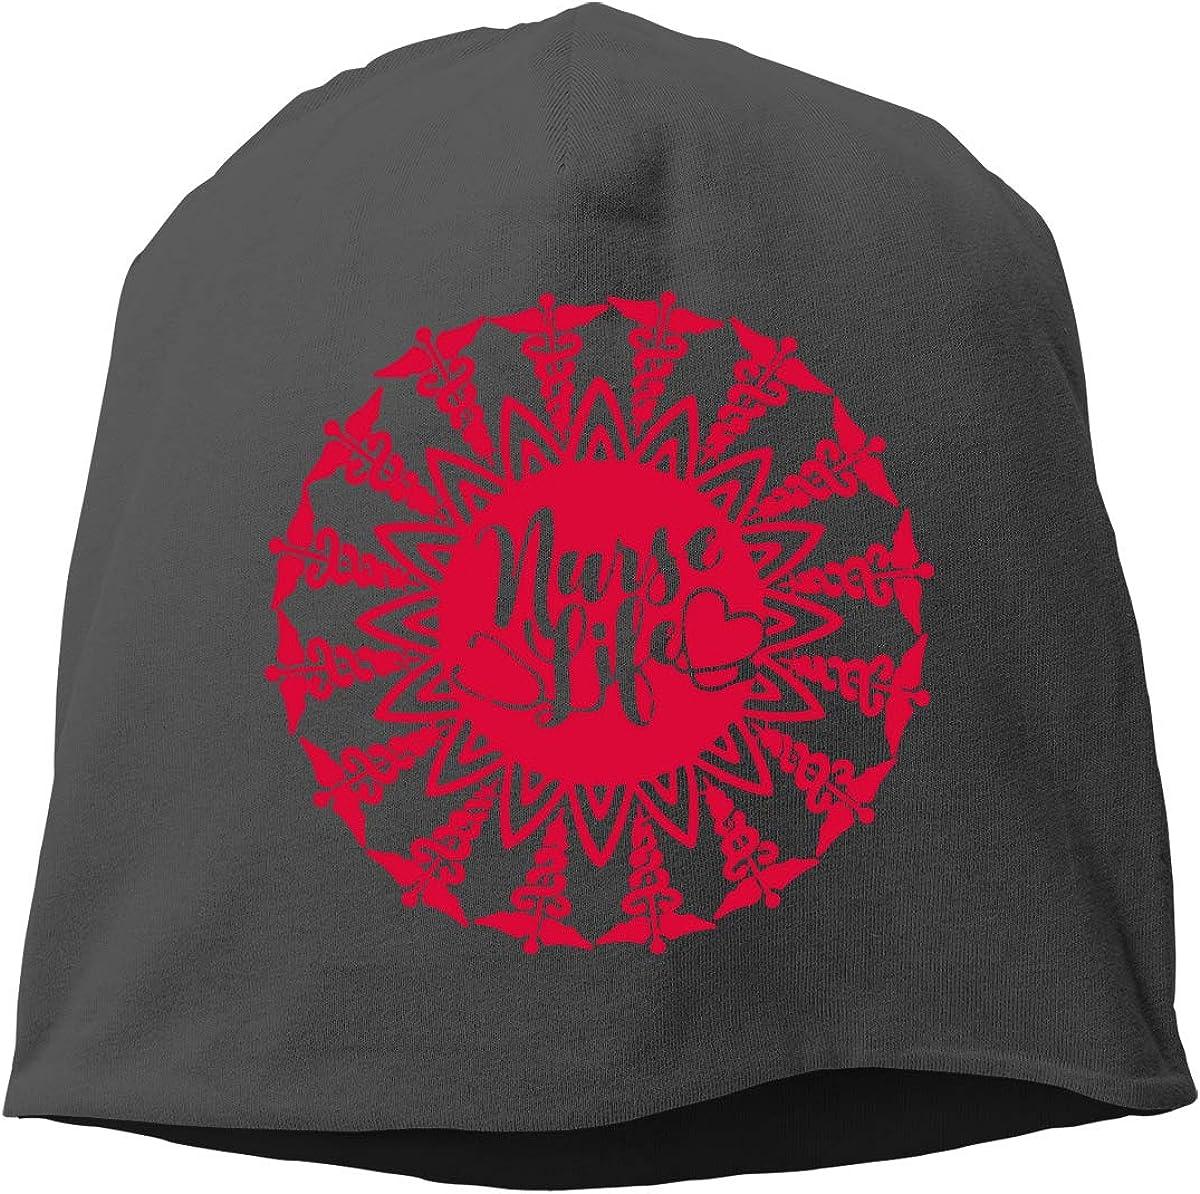 Winter Warm Daily Hat TLPM9LKMBM Nurse Life-2 Beanie Skull Cap for Women and Men